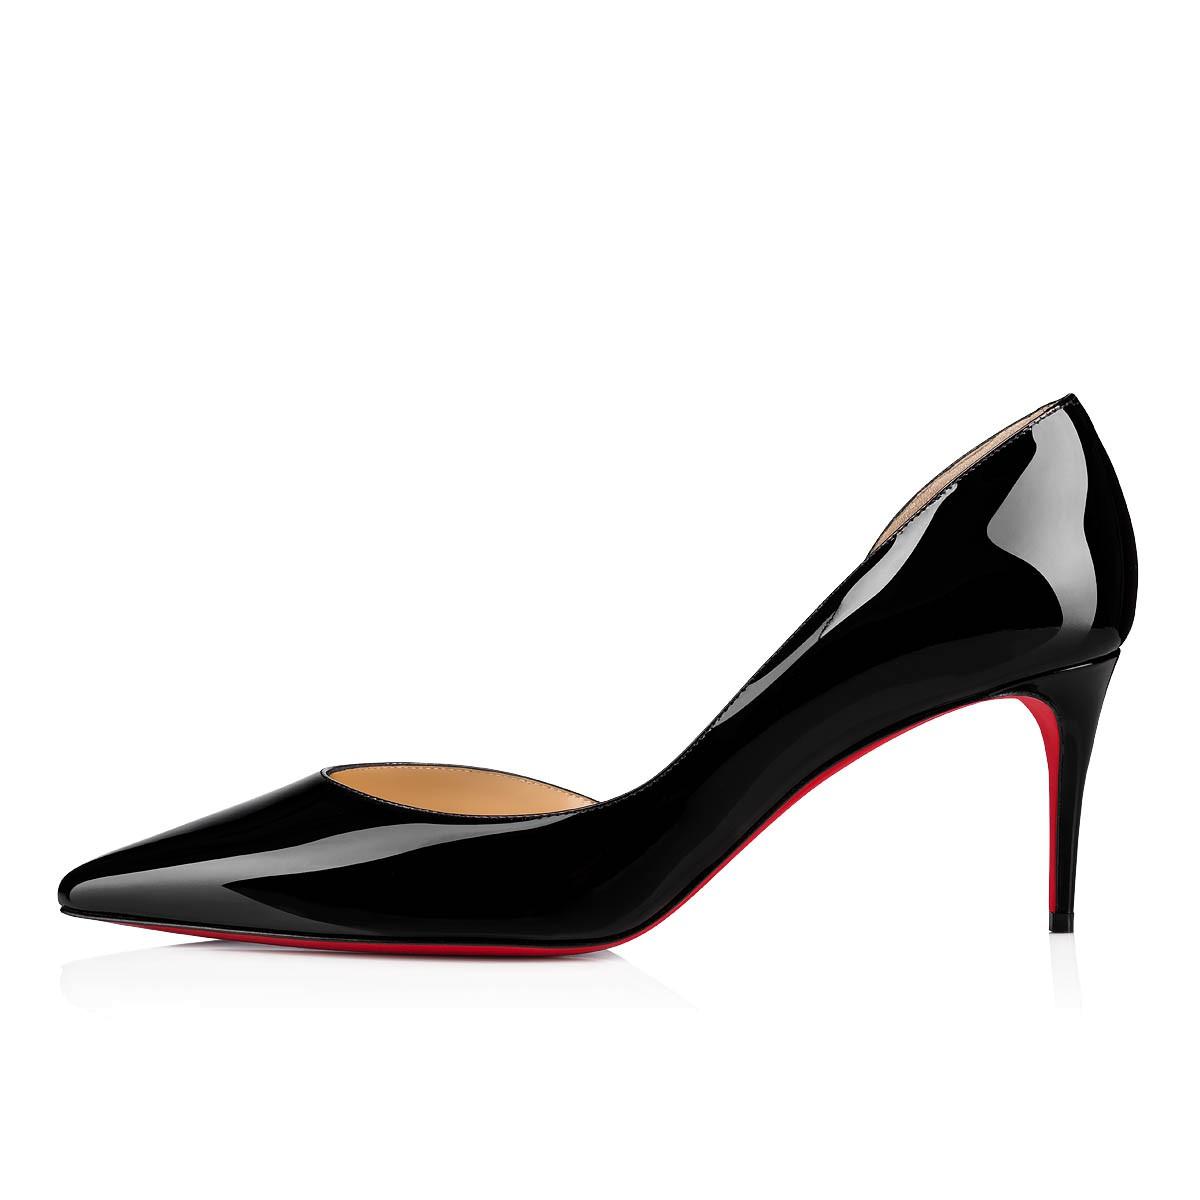 鞋履 - Iriza - Christian Louboutin